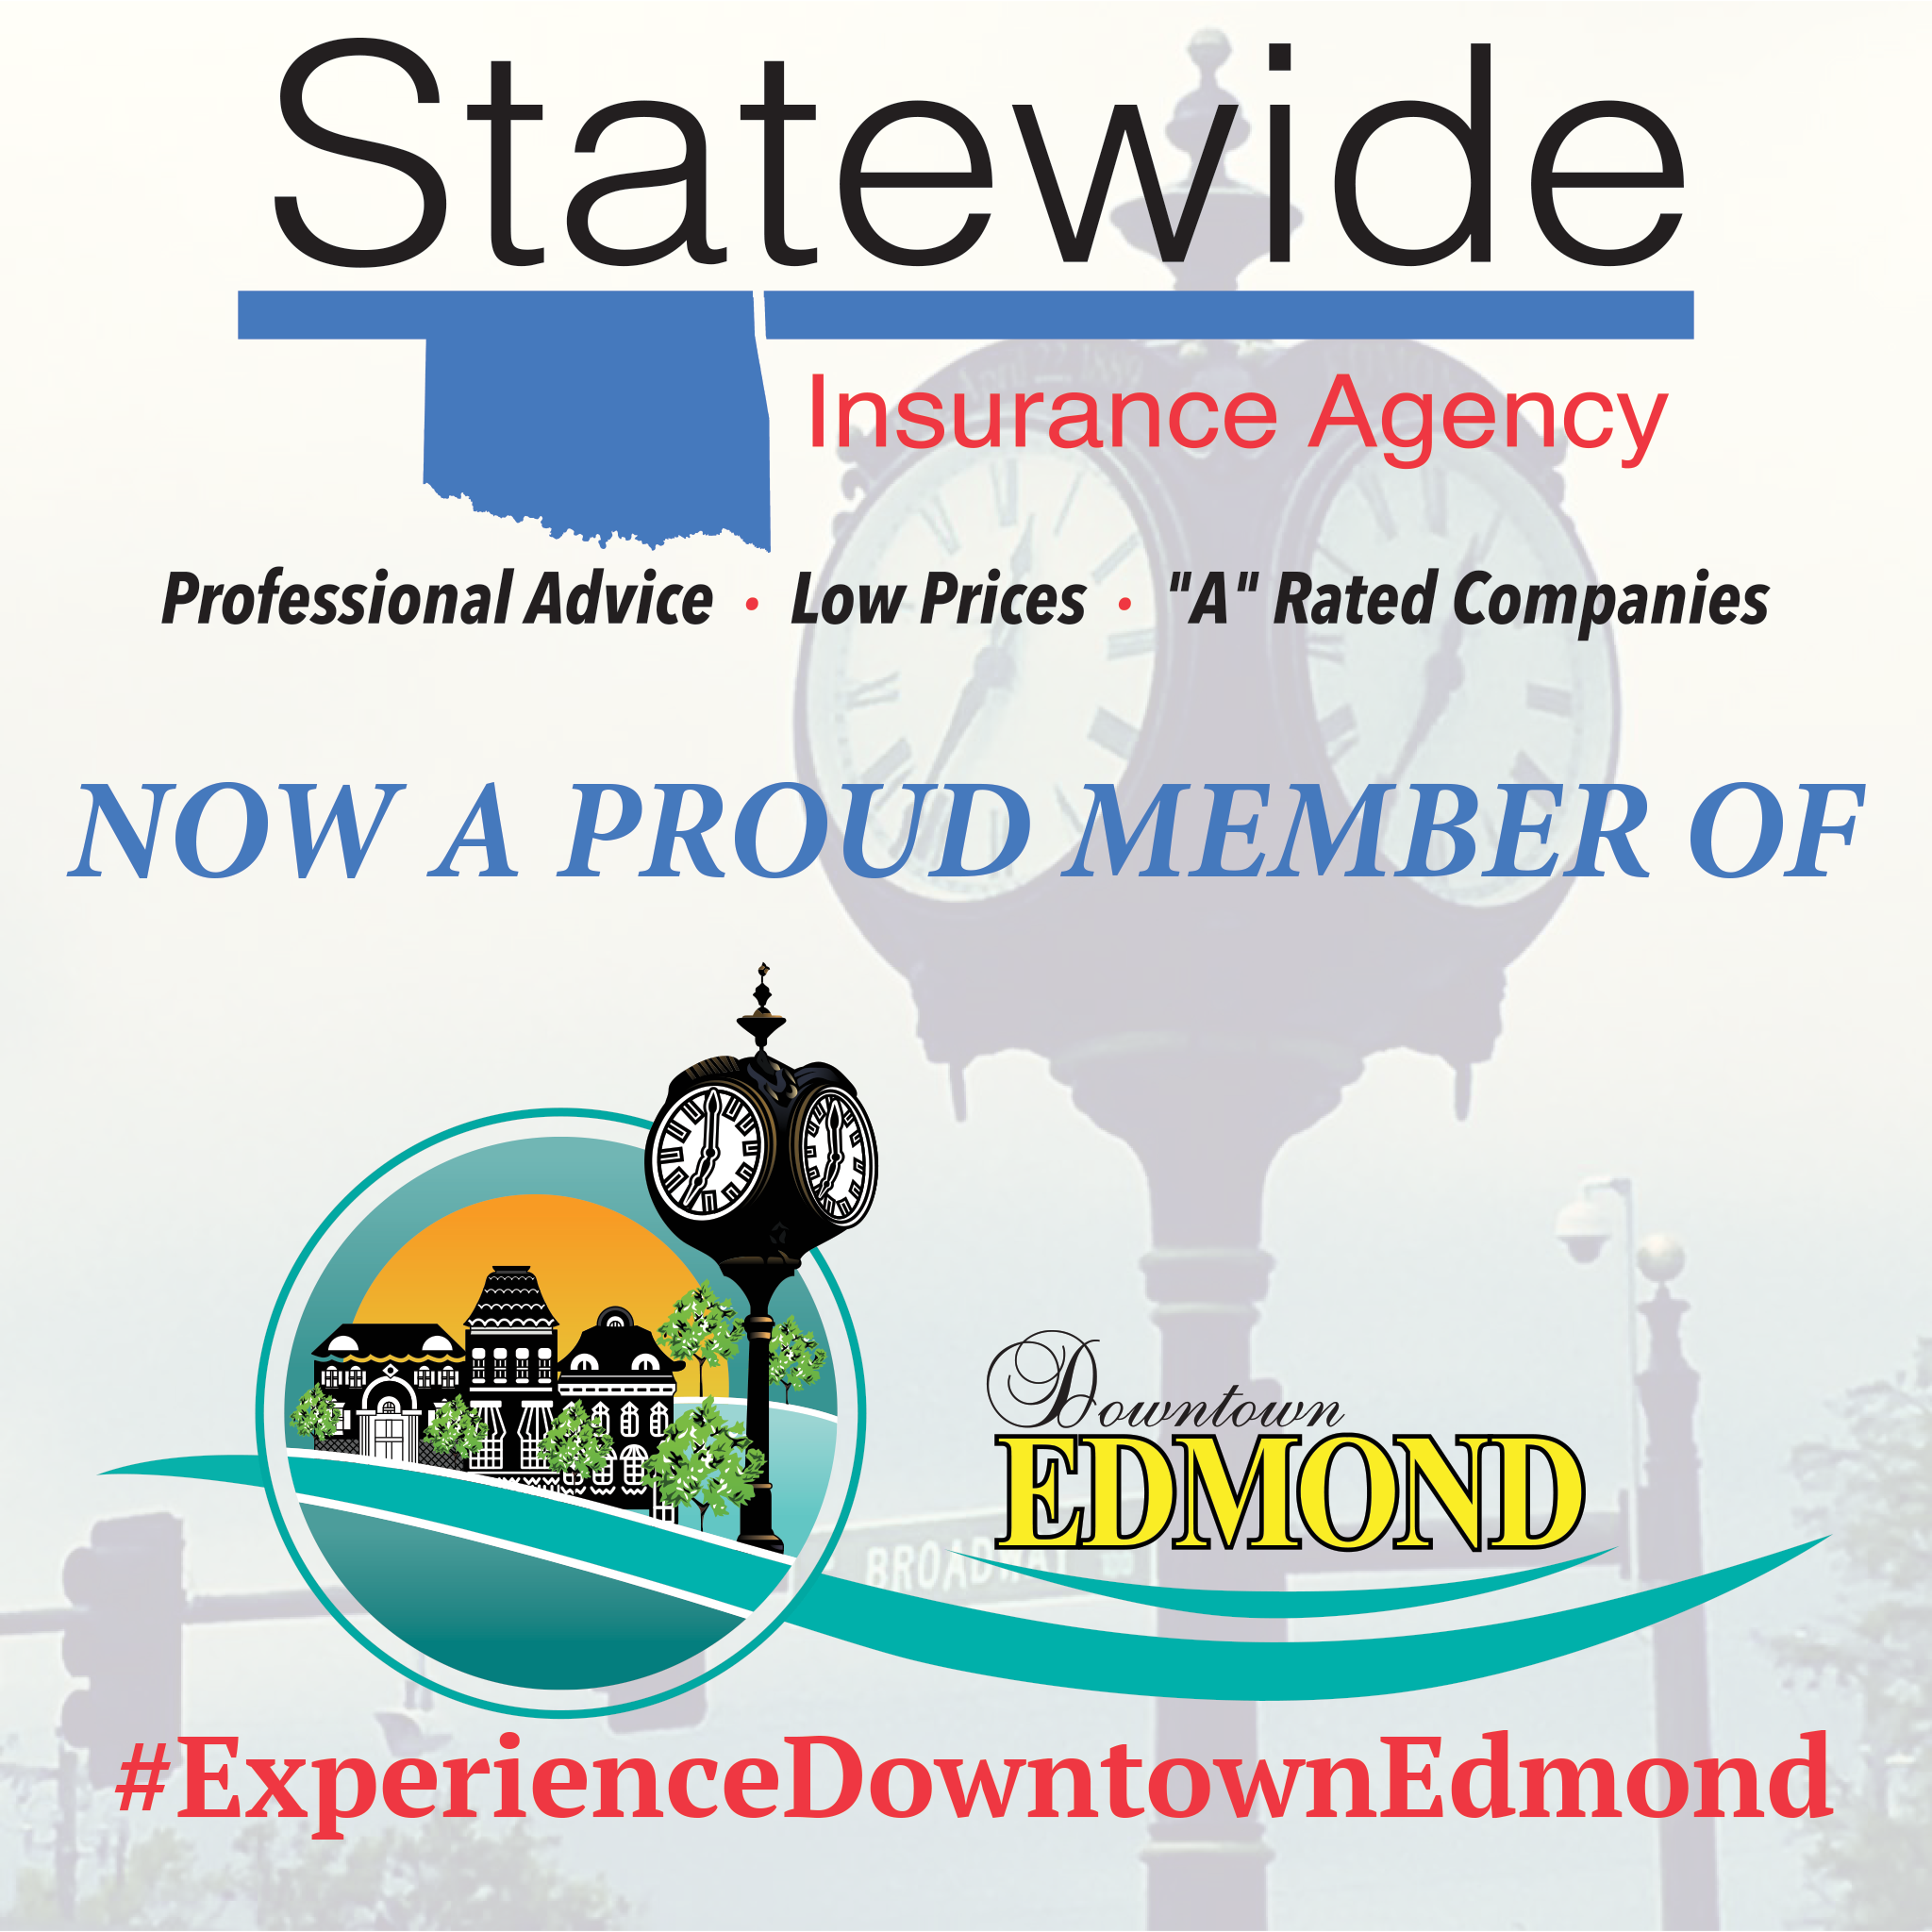 member-experiencedowntownedmond-okstatewide405